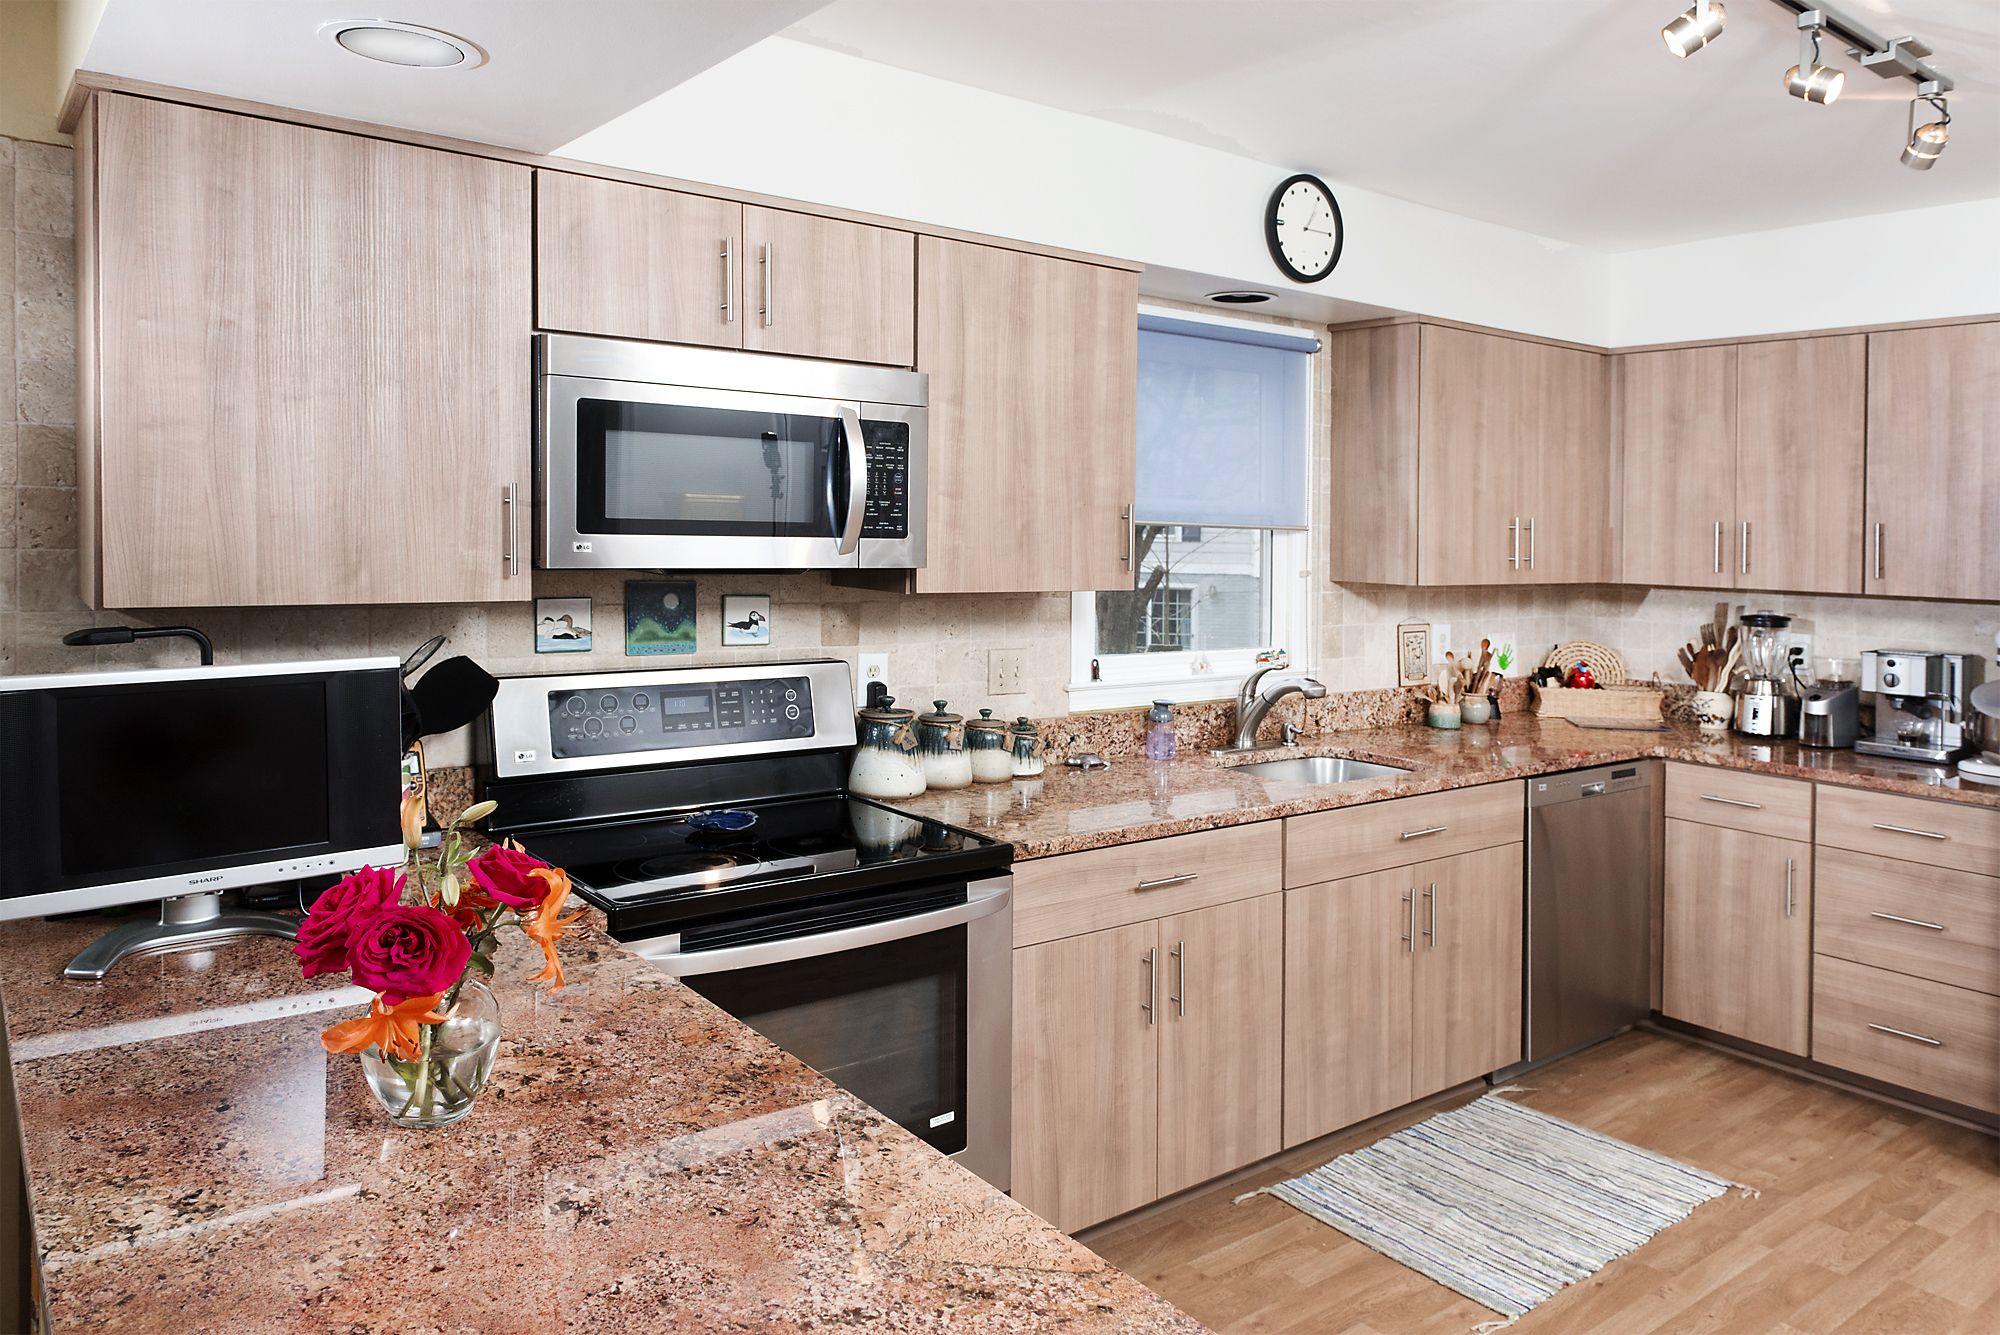 rockville md kitchen refacing kitchen cabinets kitchen on kitchen cabinets vertical lines id=72828